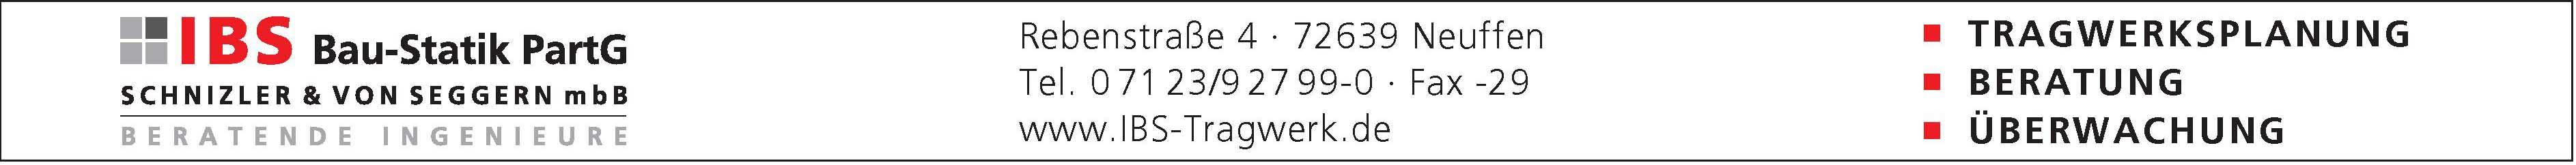 IBS Bau-Statik PartG ,SCHNIZLER & VON SEGGERN mbB